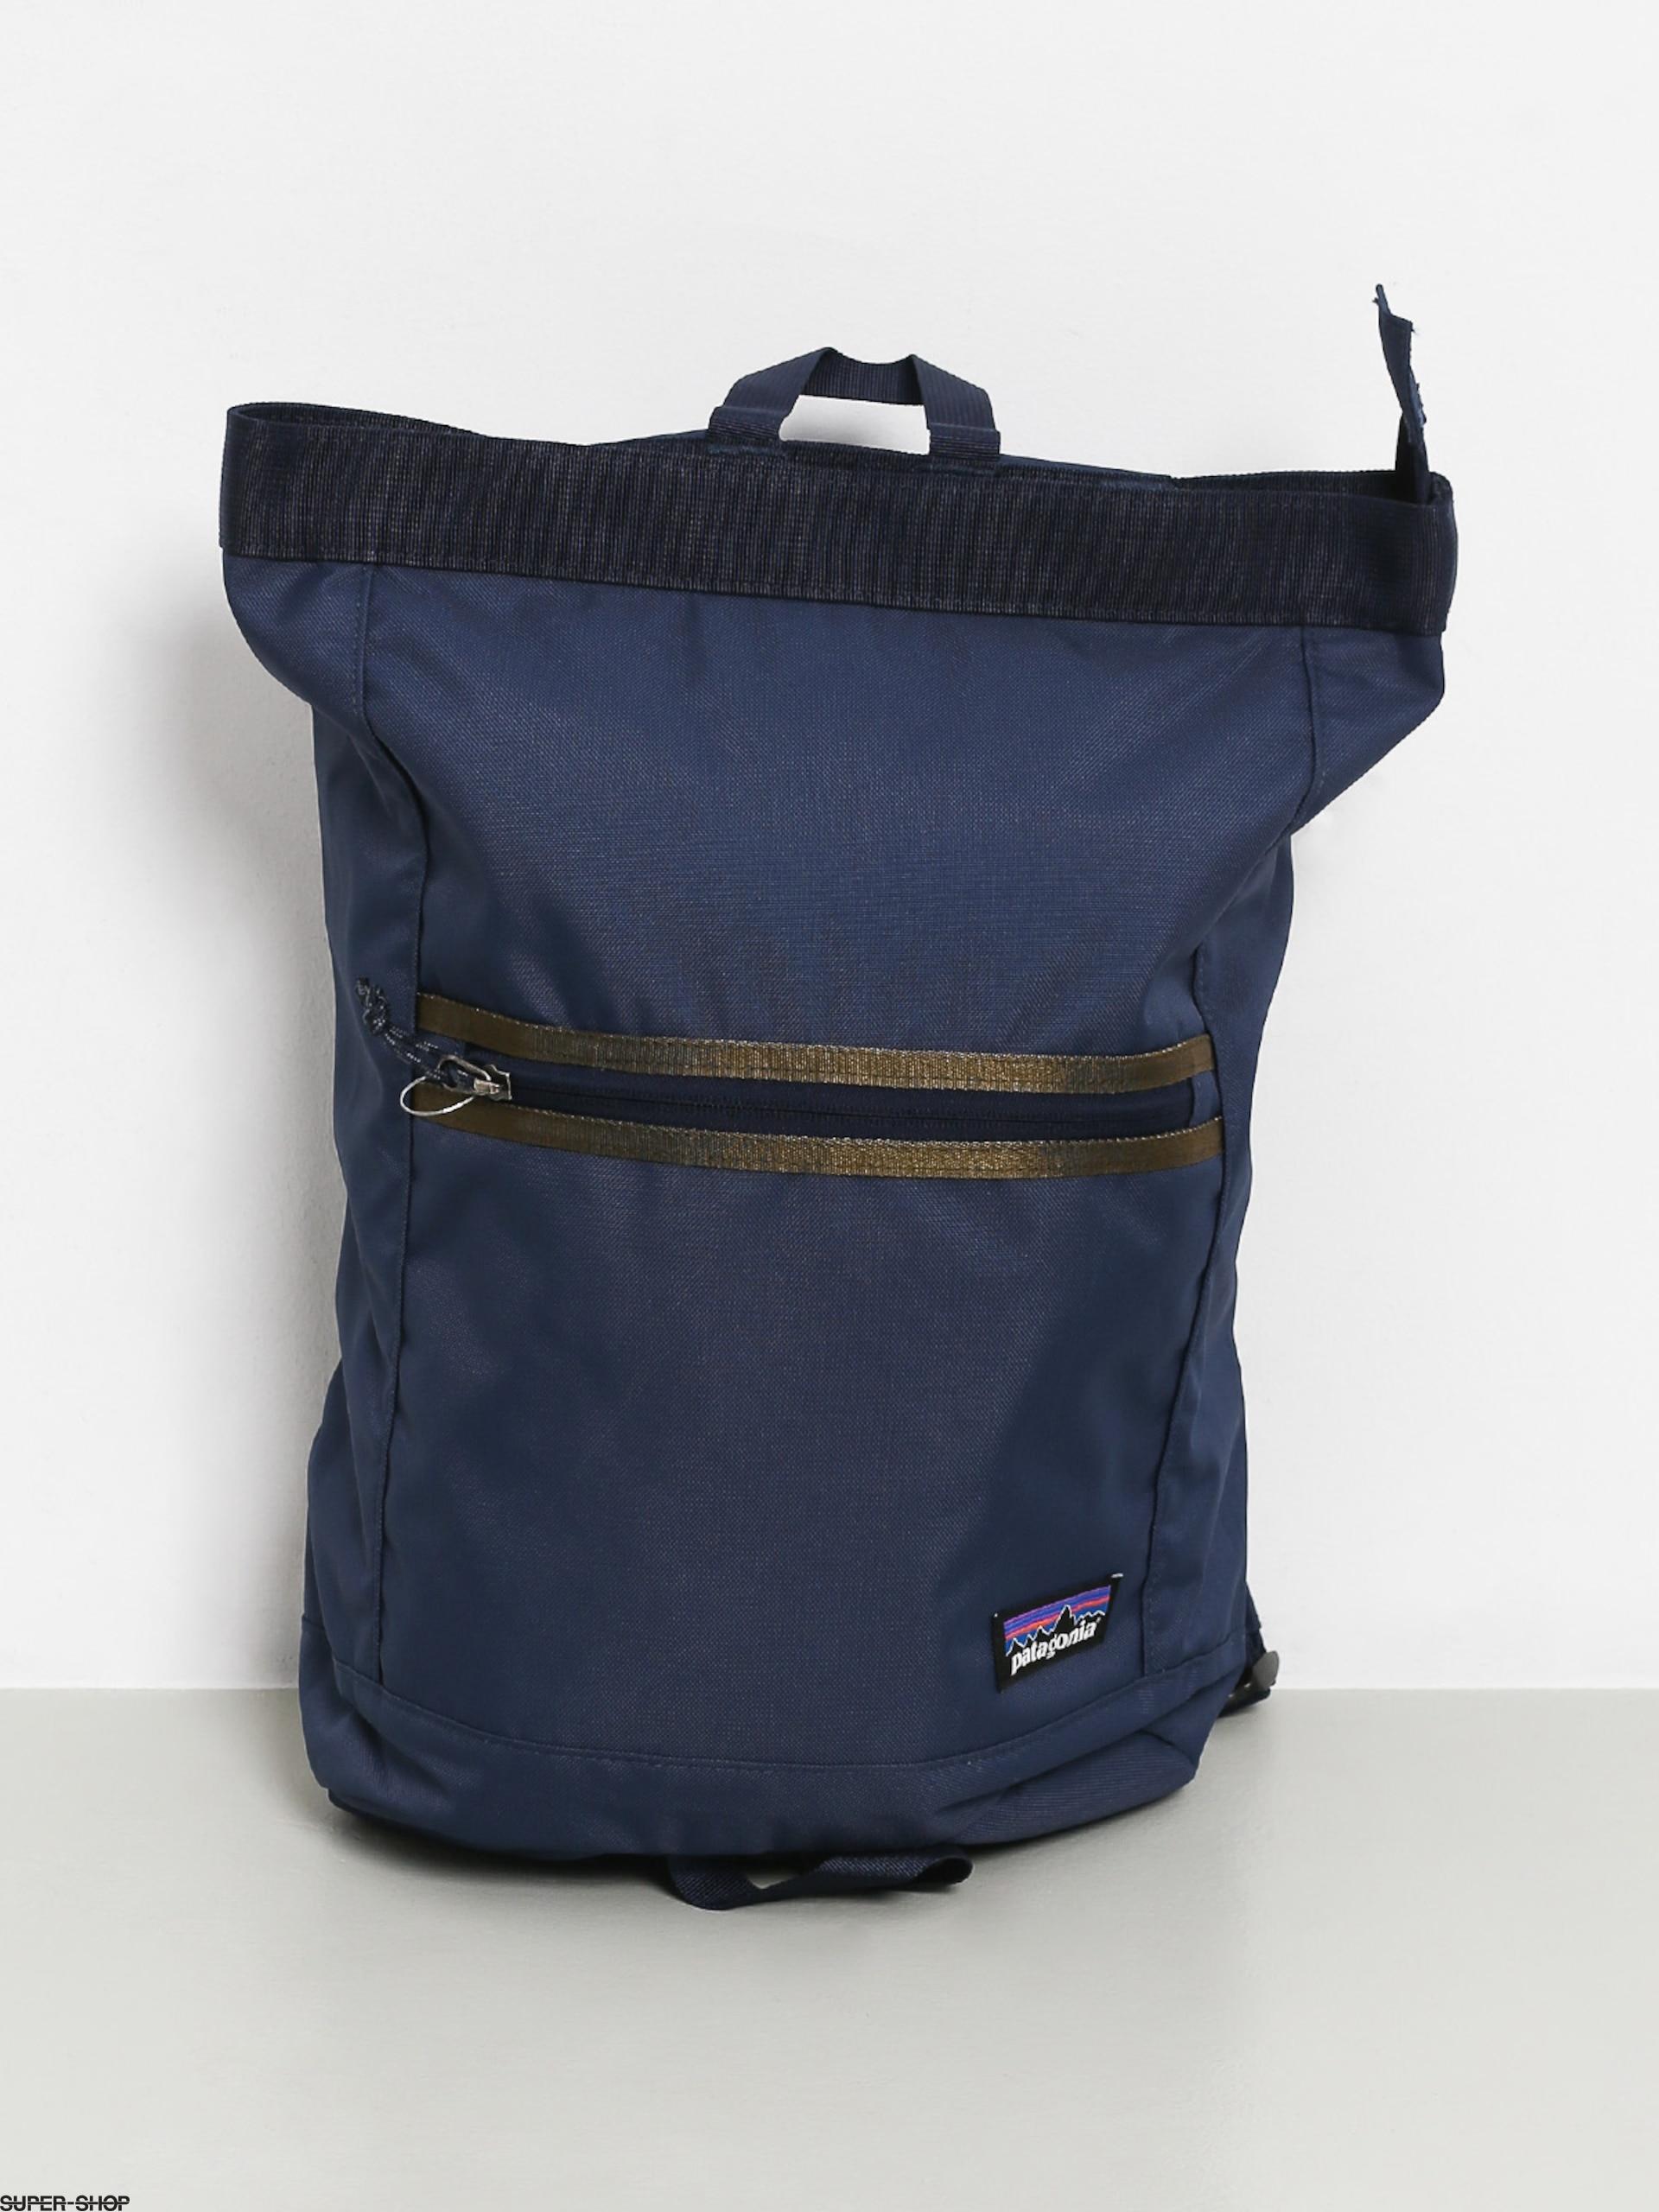 e2ae704442eaa 1020564-w1920-patagonia-arbor-market-pack-15l-backpack-classic-navy.jpg